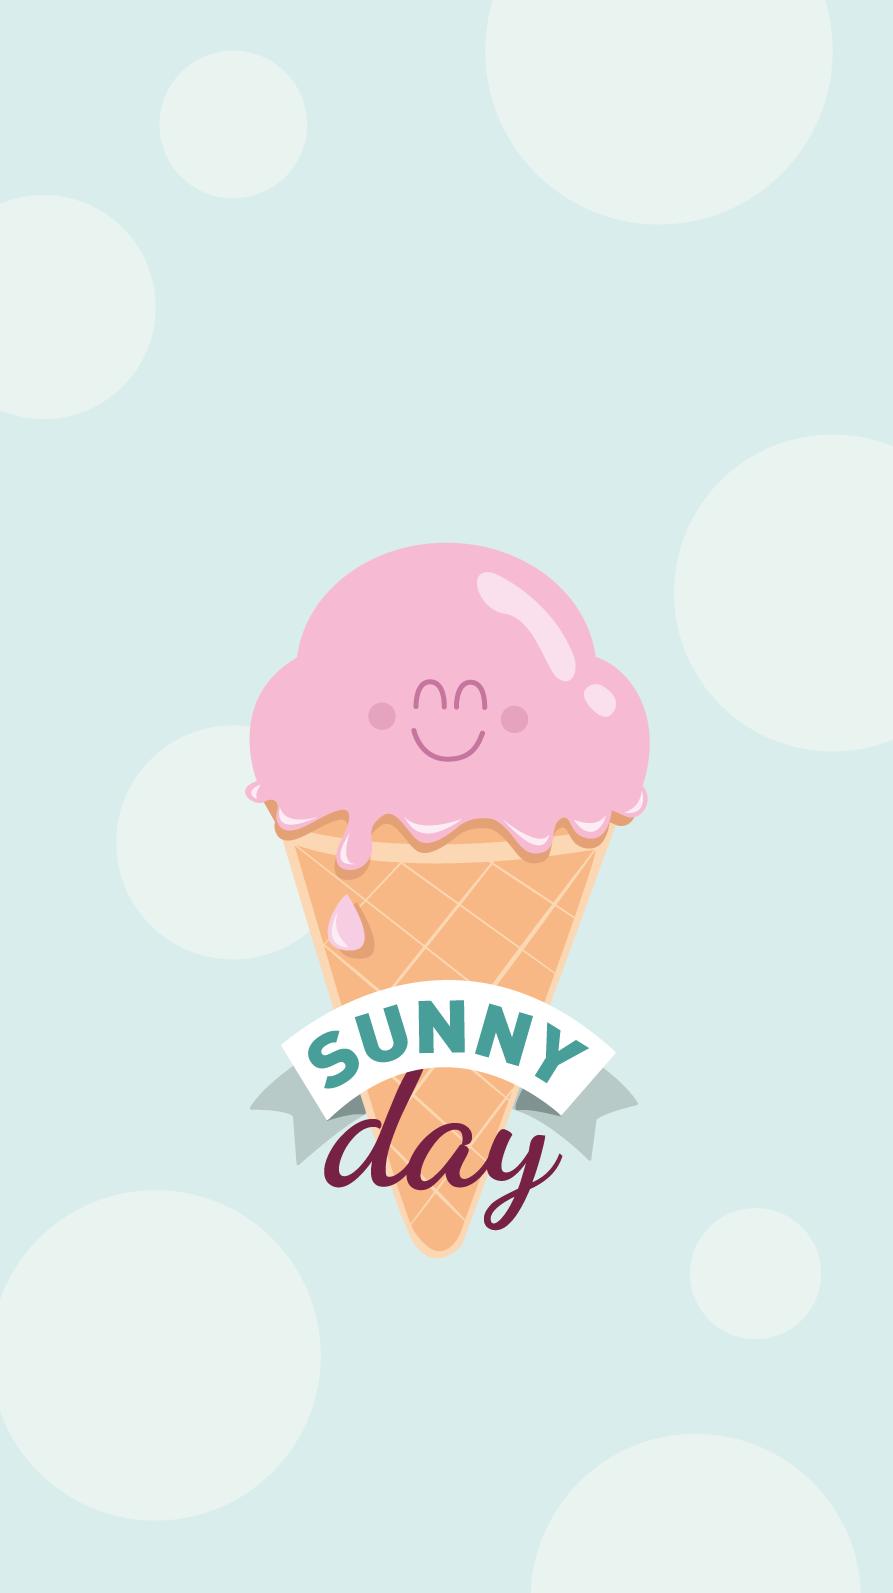 SunnyDay-iphone5